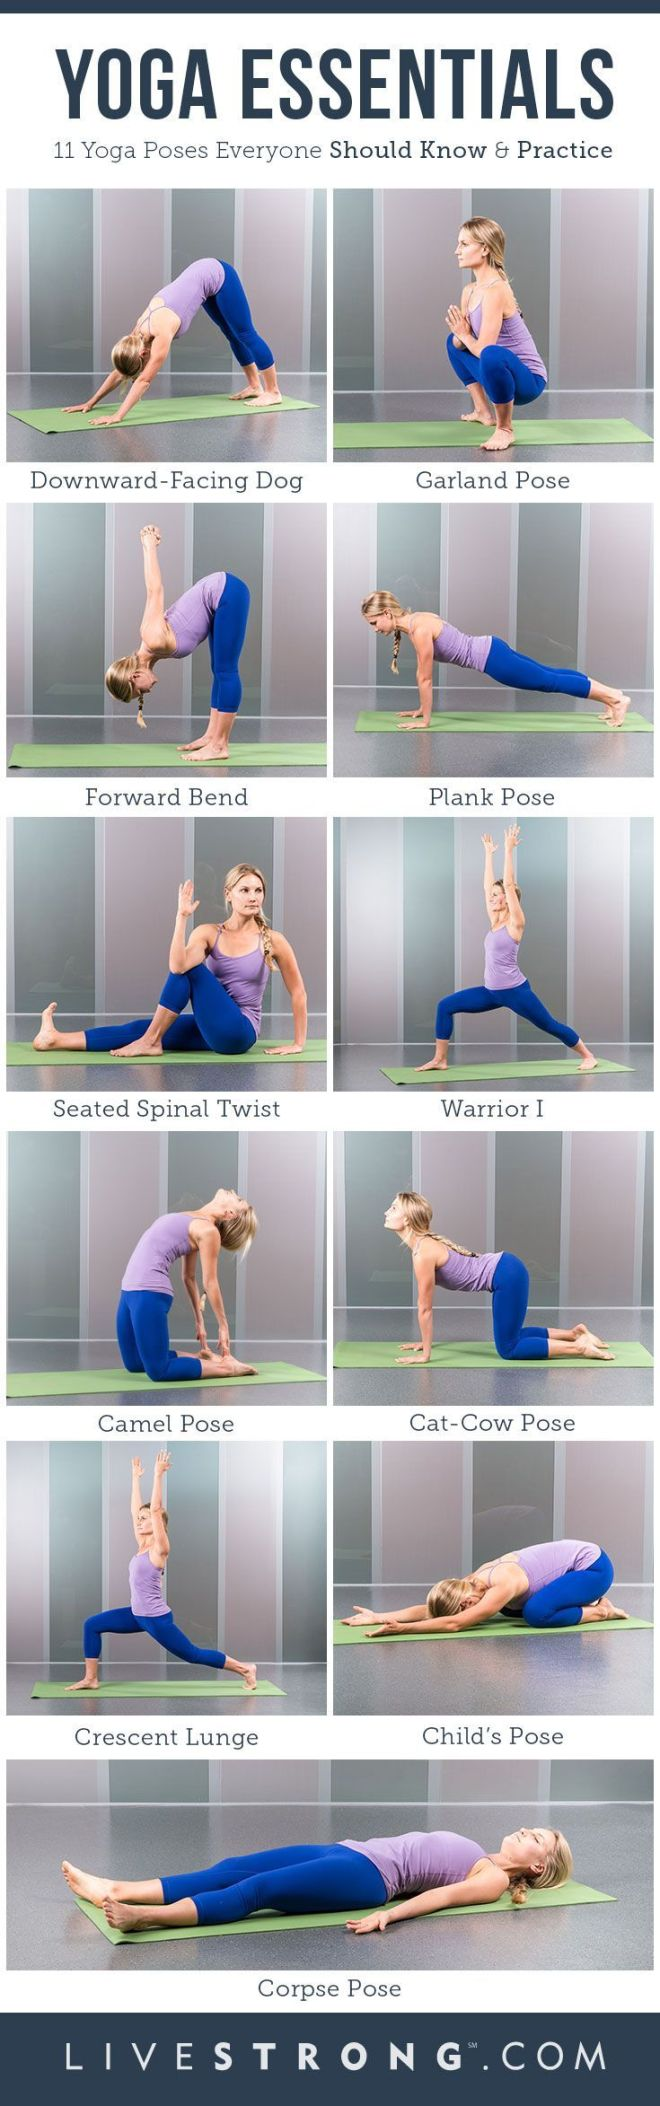 11 Essential Yoga Poses Everyone Should Practice: